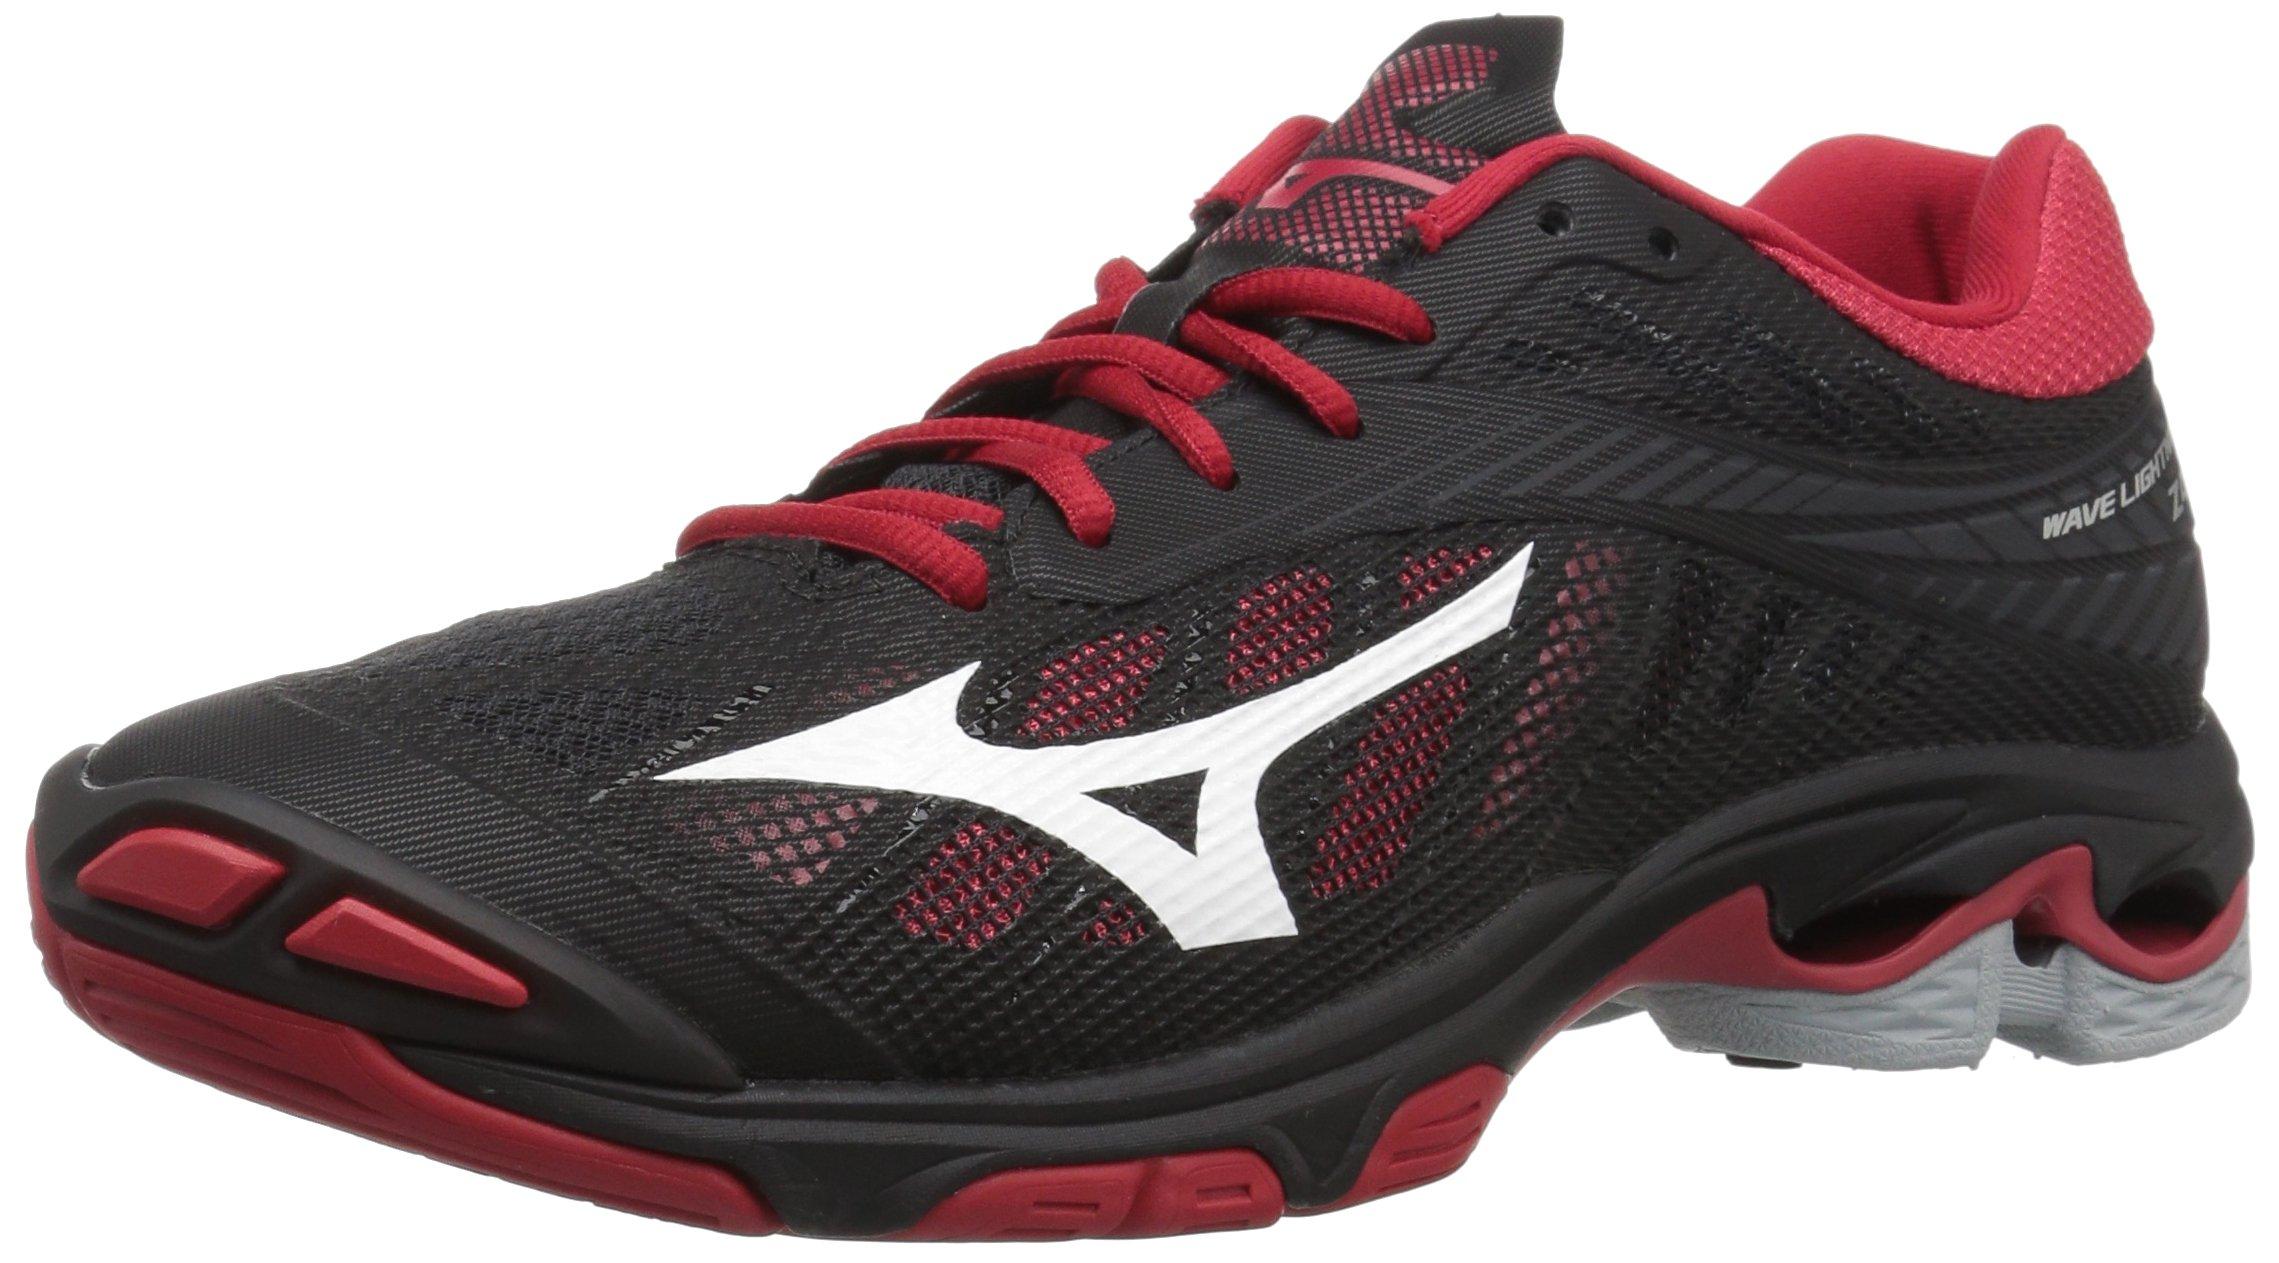 Mizuno Wave Lightning Z4 Volleyball Shoes, Black/red Women's 6.5 B US